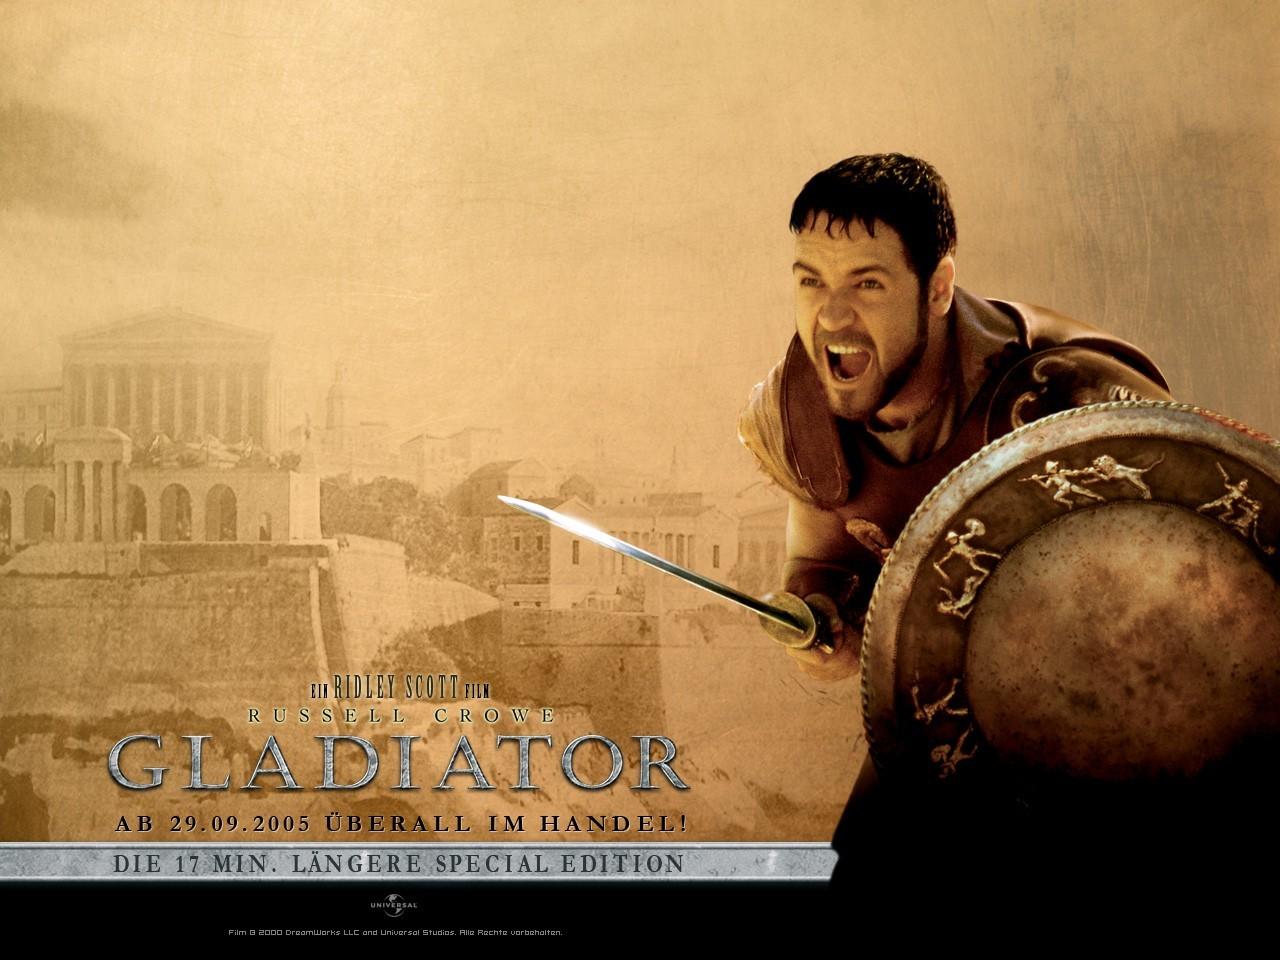 http://3.bp.blogspot.com/-yJ_0EREbEh0/UK-bhb_SCpI/AAAAAAAAAQc/jckAiOk_CZ4/s1600/Gladiator_018.jpg